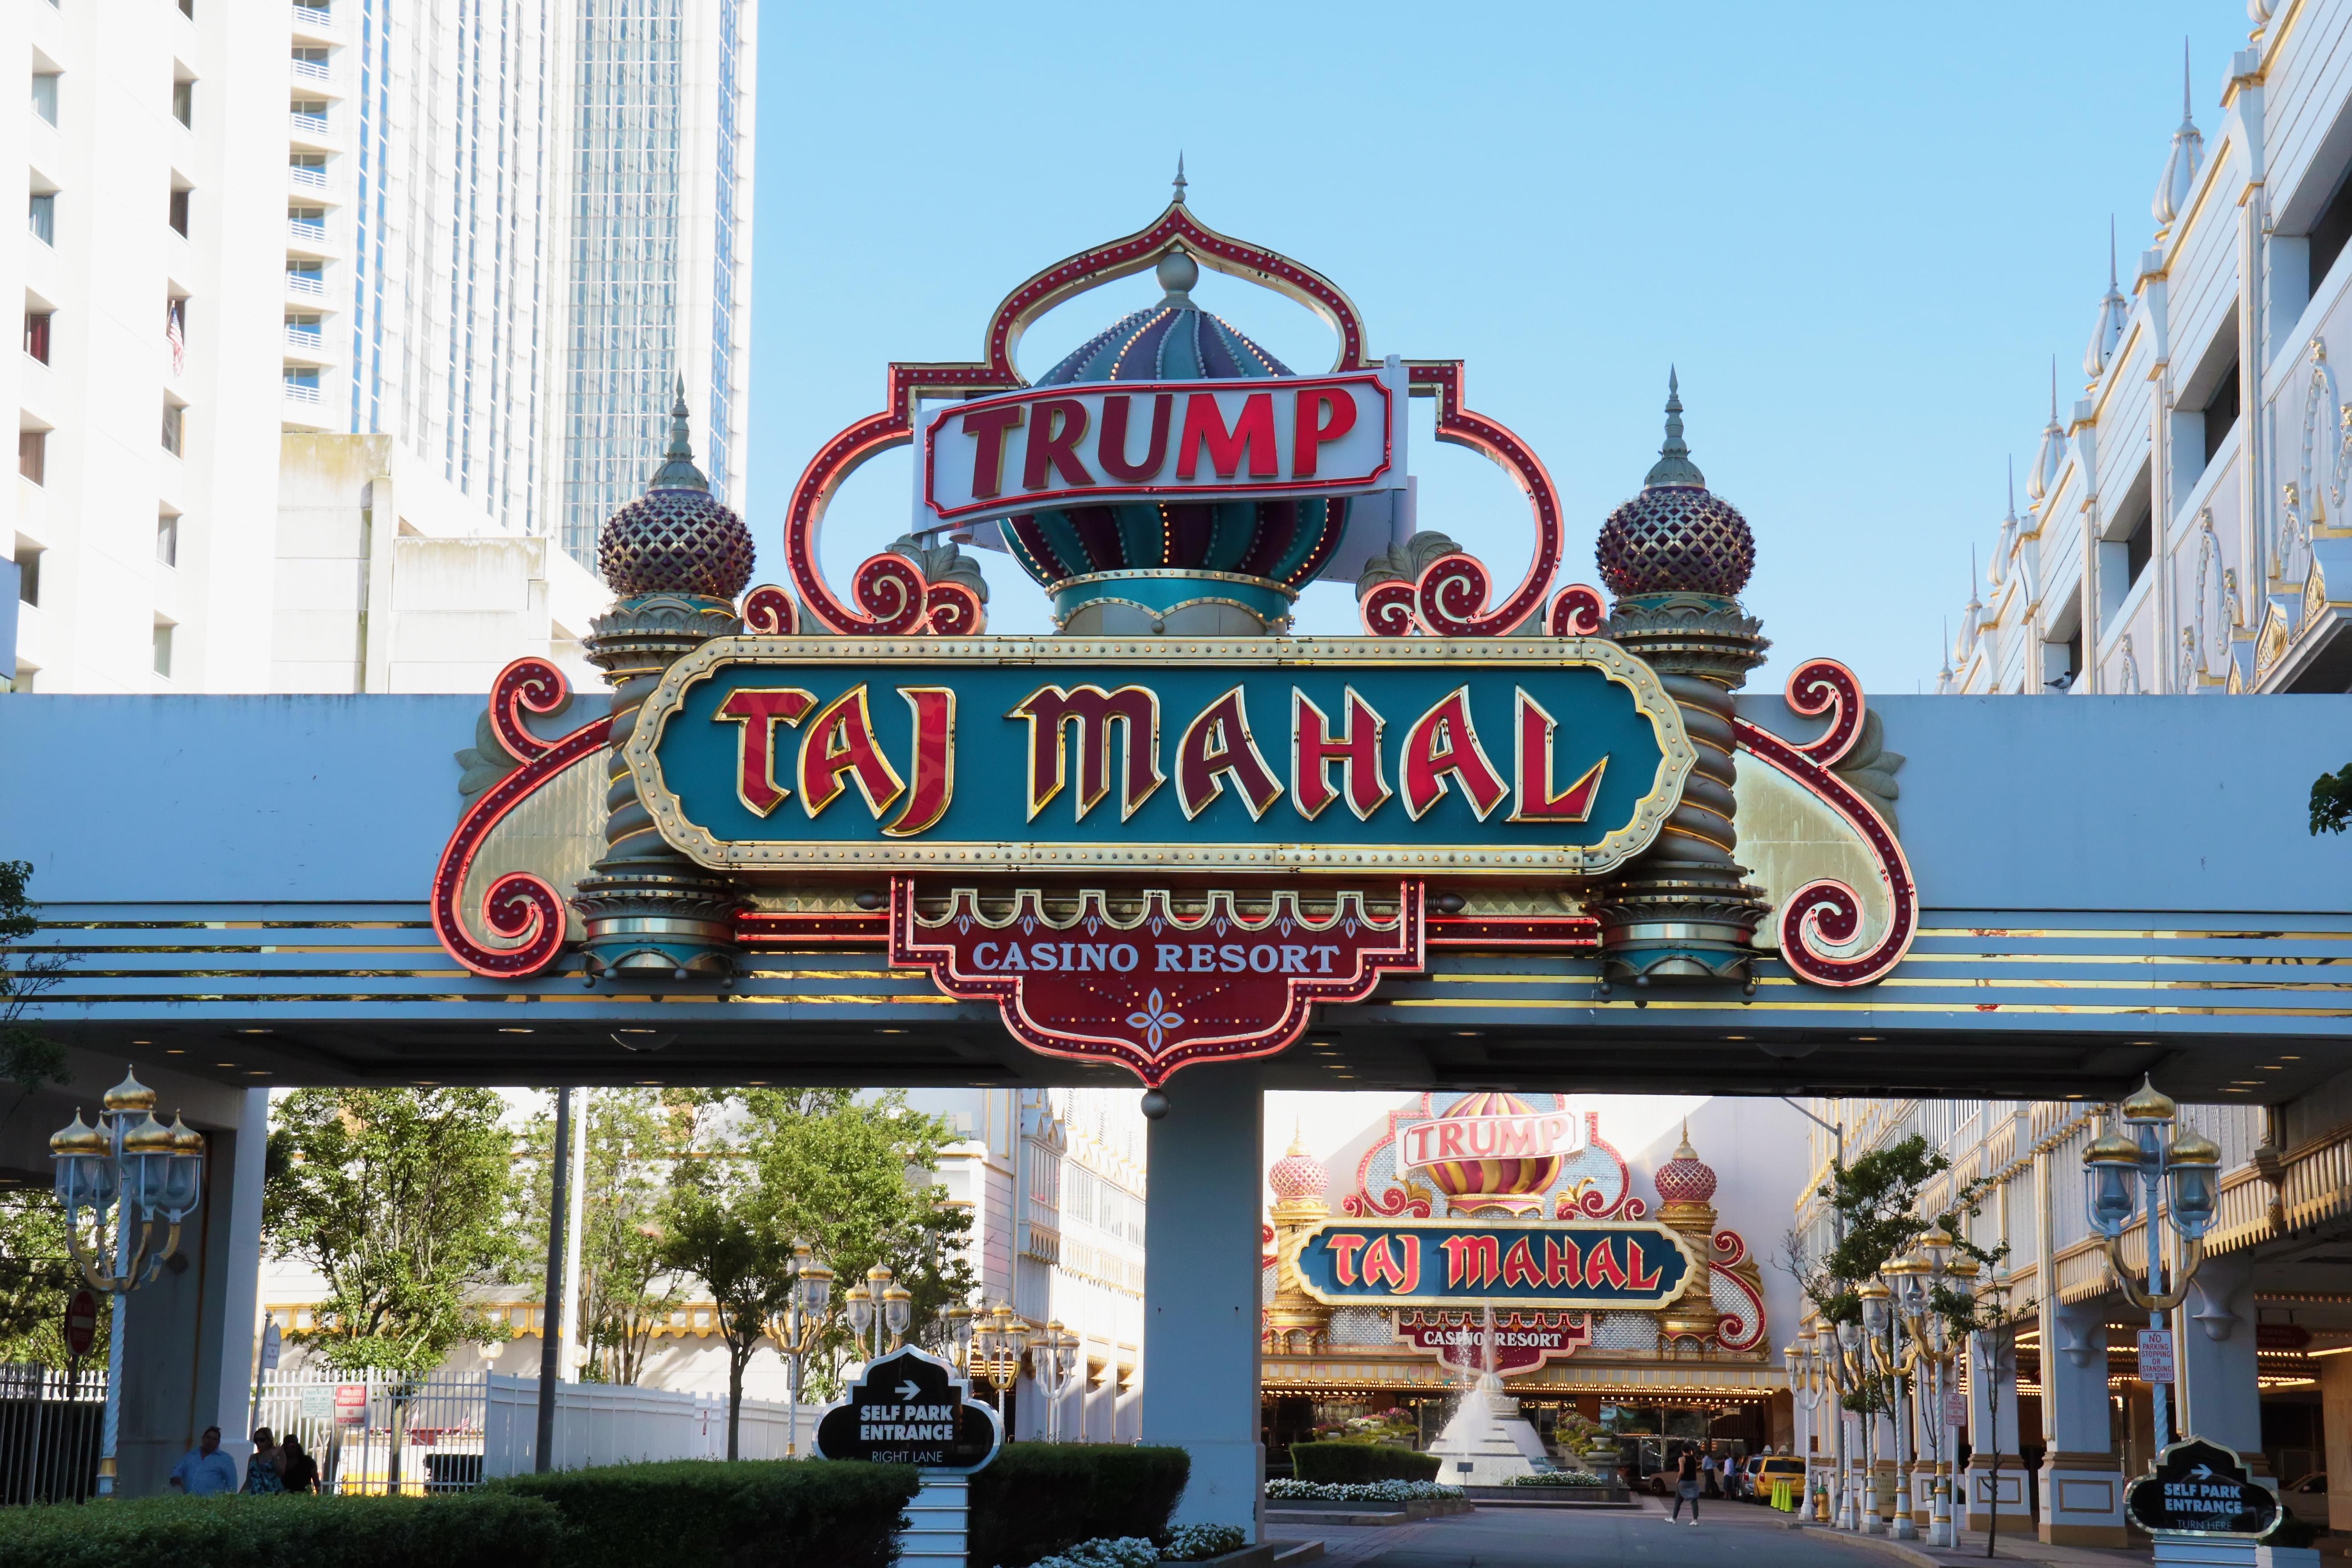 Trump Taj Mahal Announces Closure At The End Of 2016 Summer Season